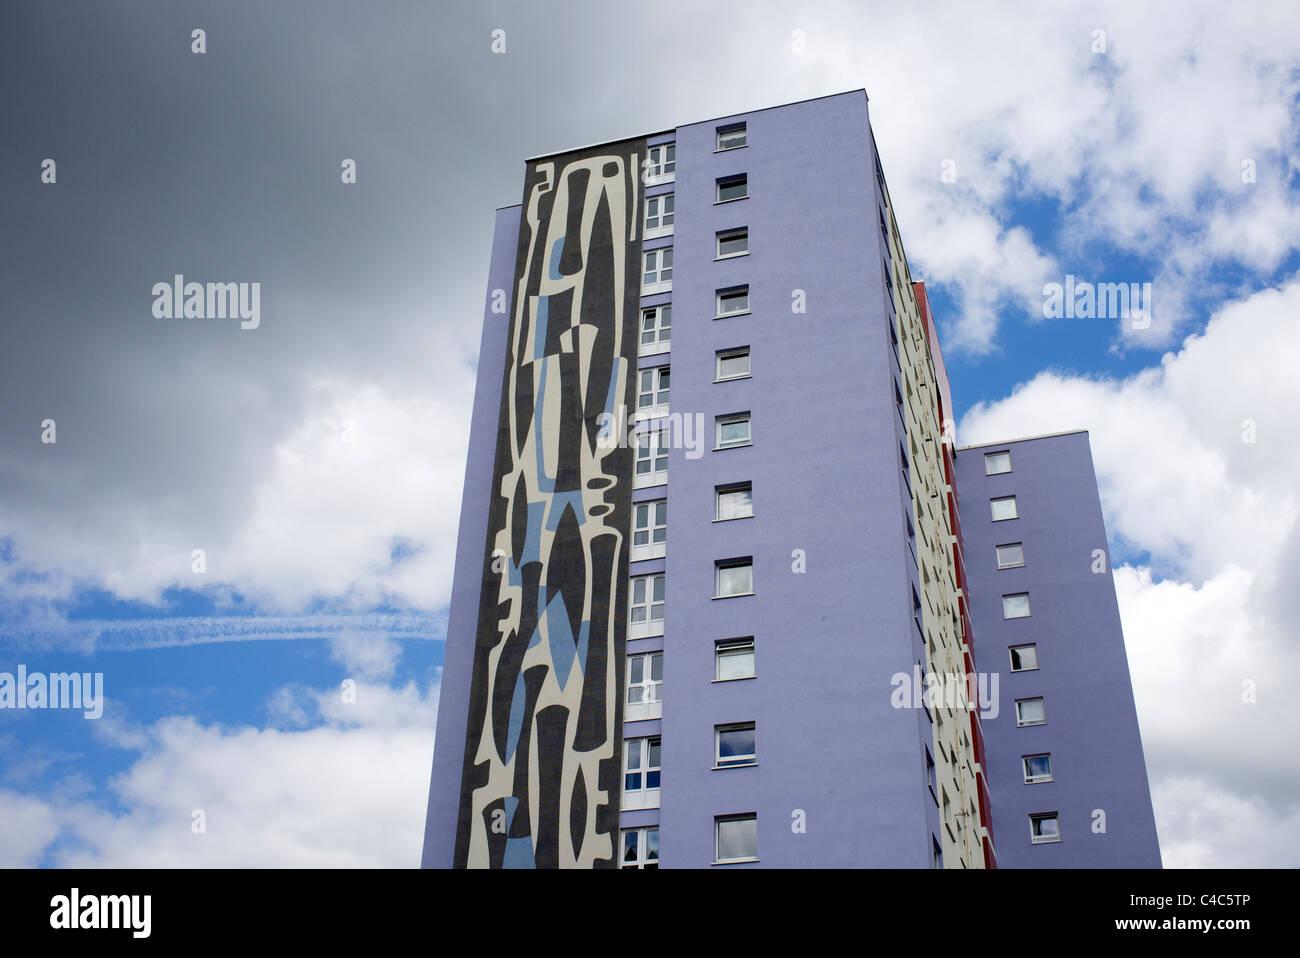 refurbished high rise block of flats - Stock Image